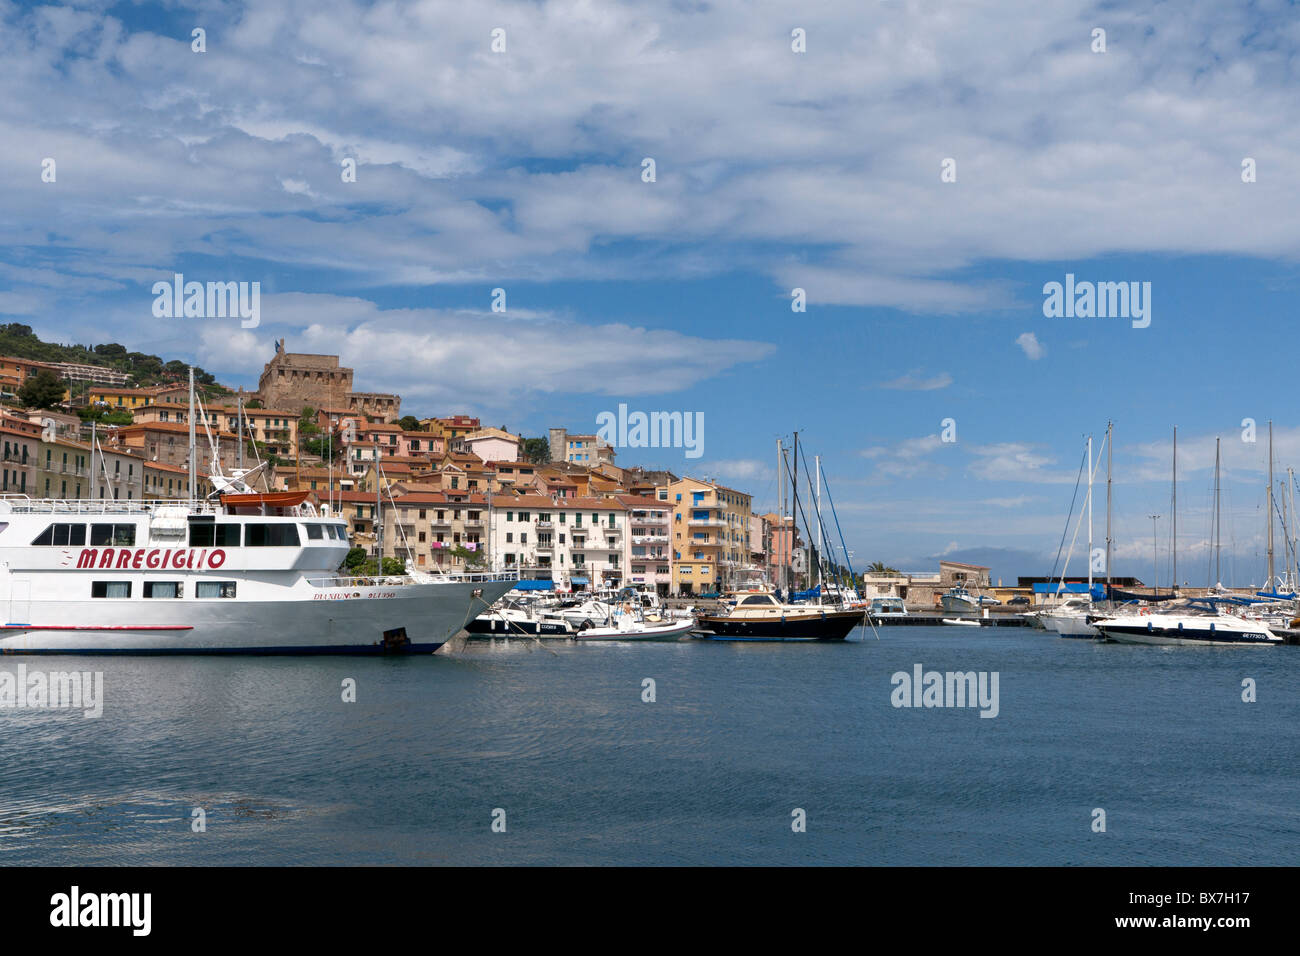 Porto Sante Stefano, Monte Argentario, Tuscany, Italy - Stock Image